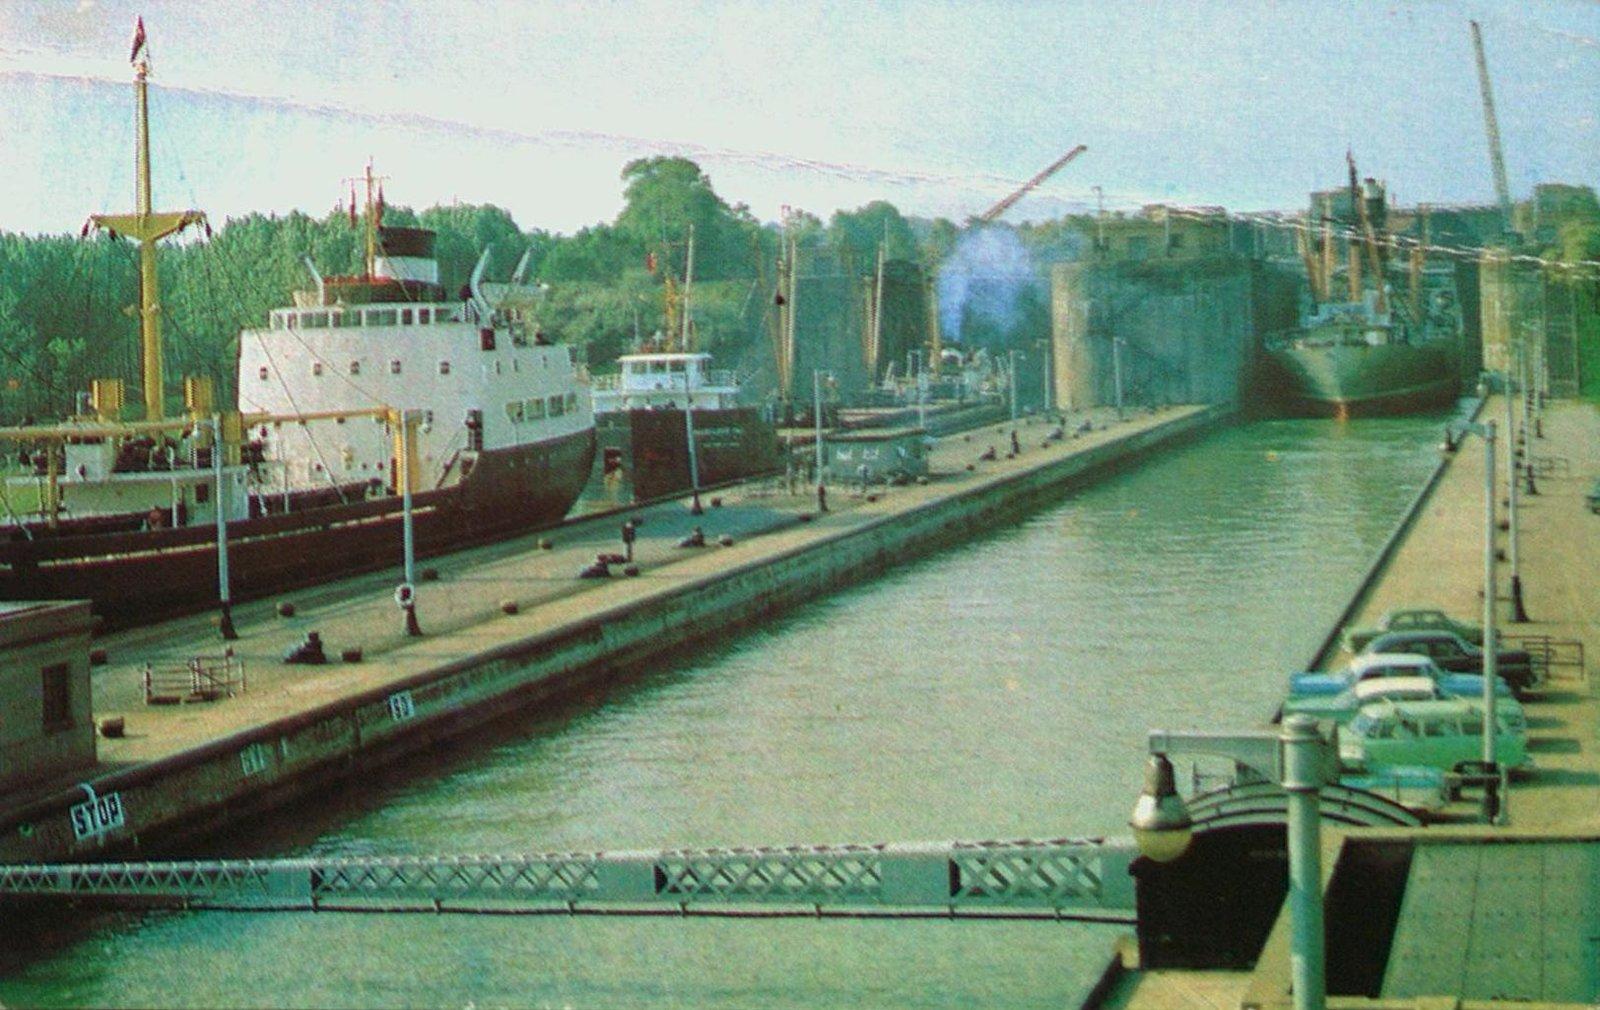 The Twin Flight Locks on the Welland Ship Canal